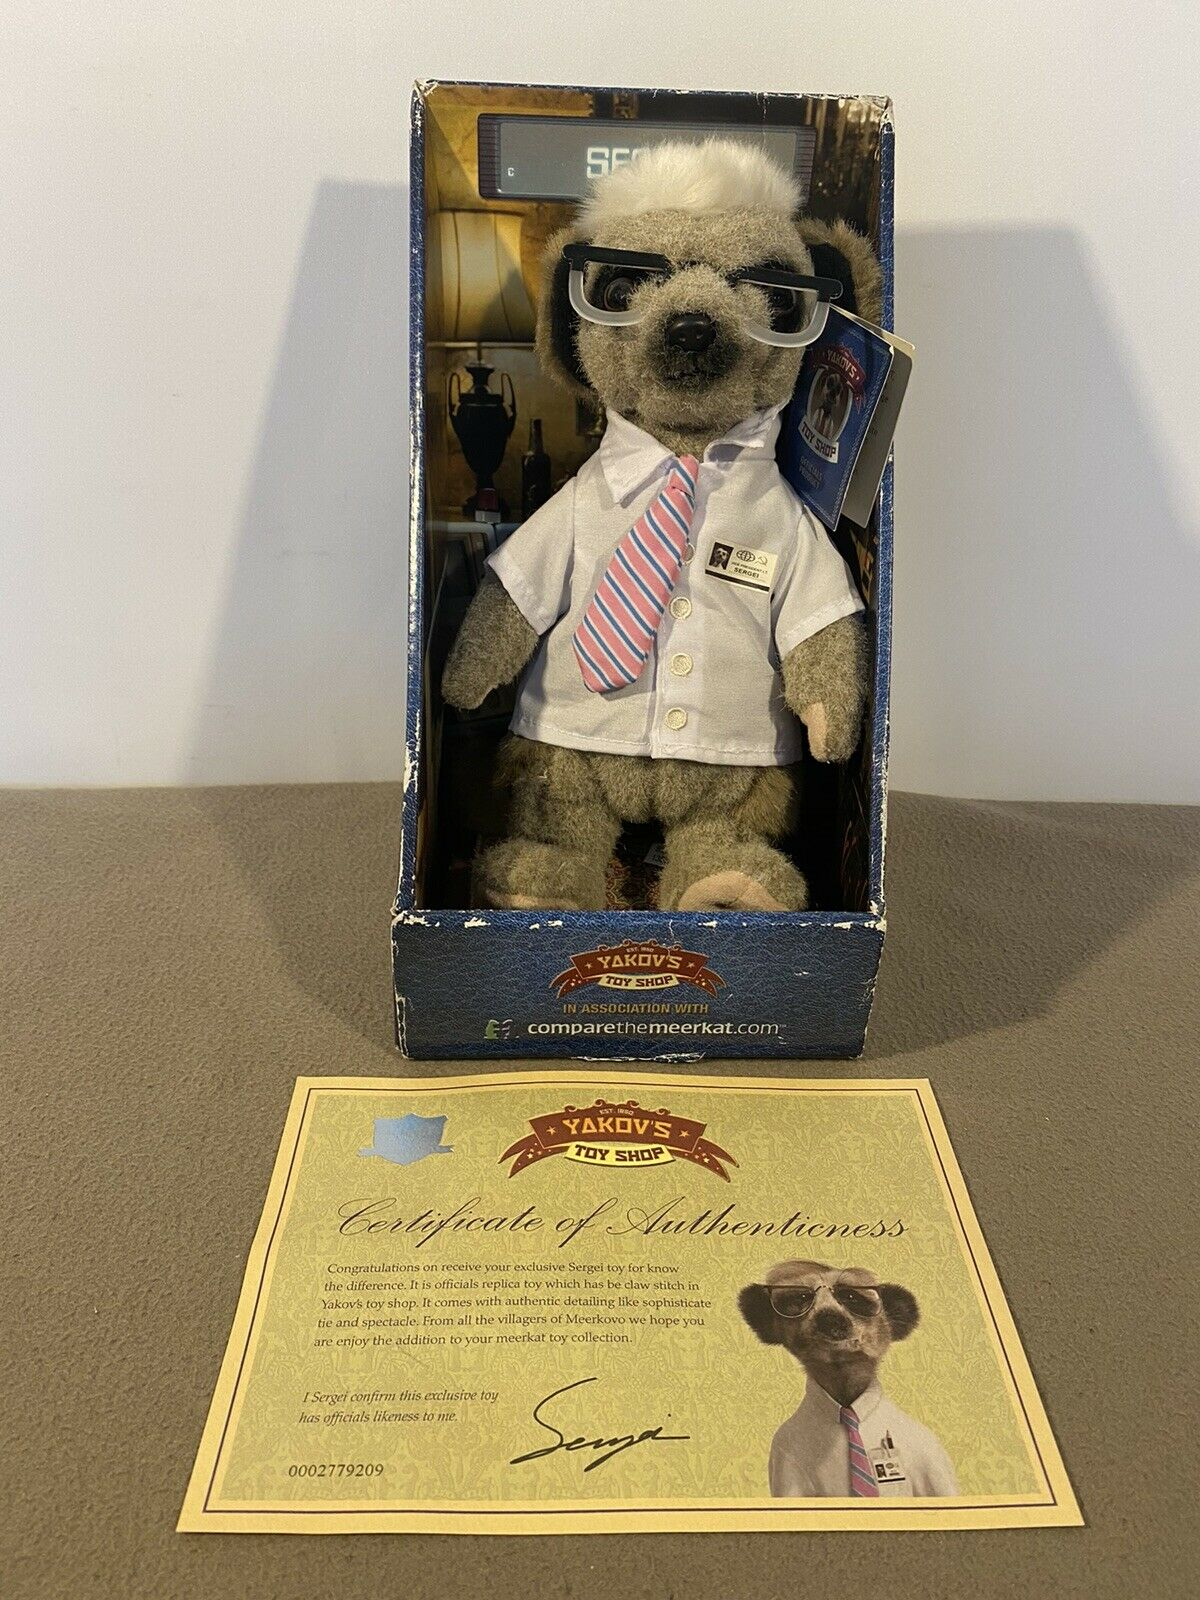 New in Box comparer The Meerkat Sergie Teddy